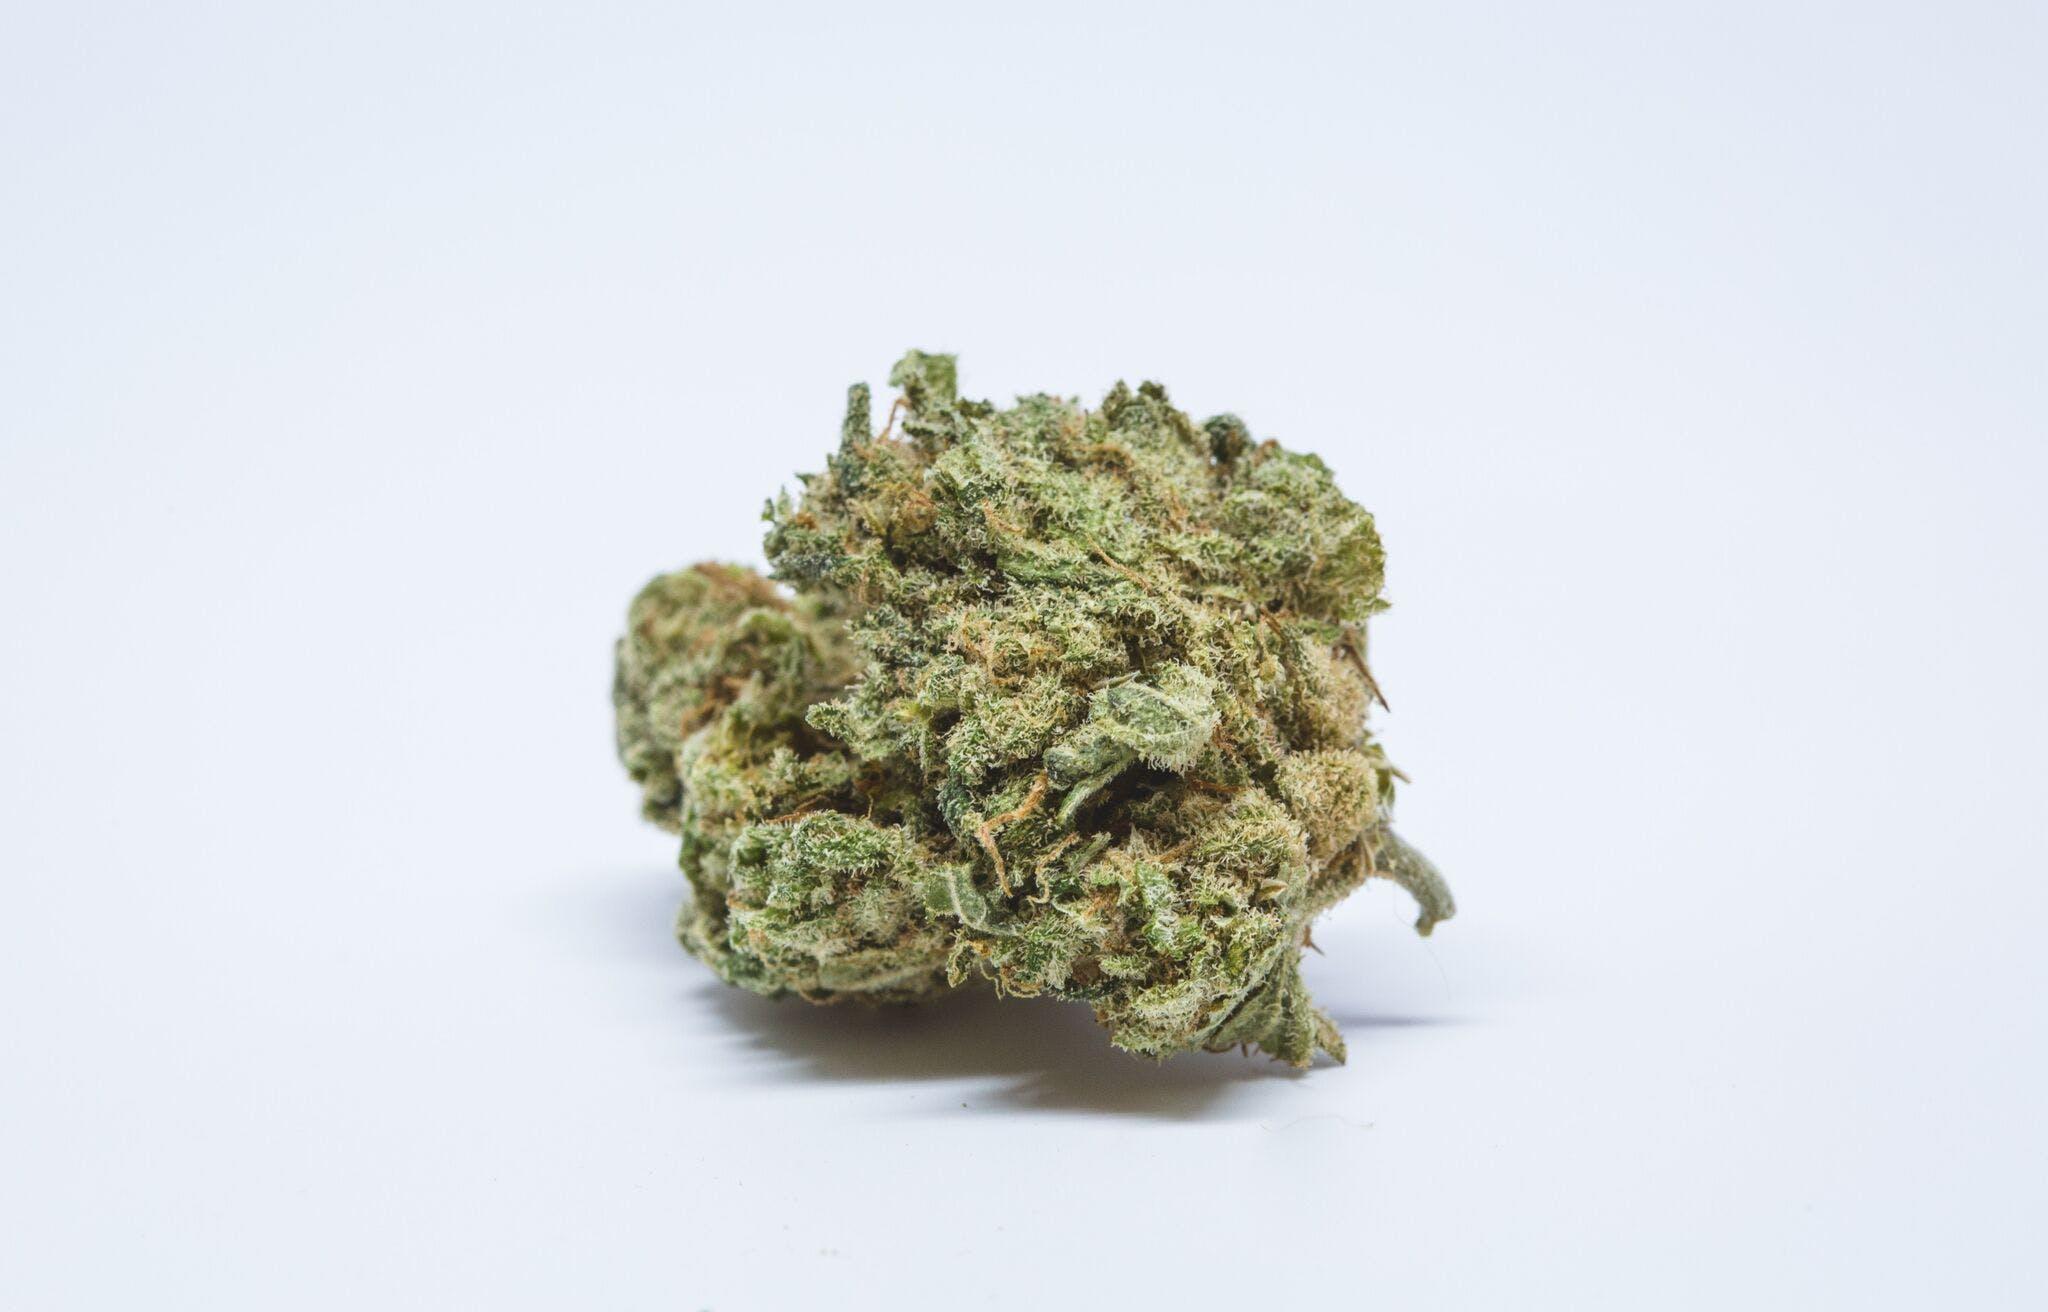 Sour Alien Weed; Sour Alien Cannabis Strains; Sour Alien Sativa Marijuana Strain